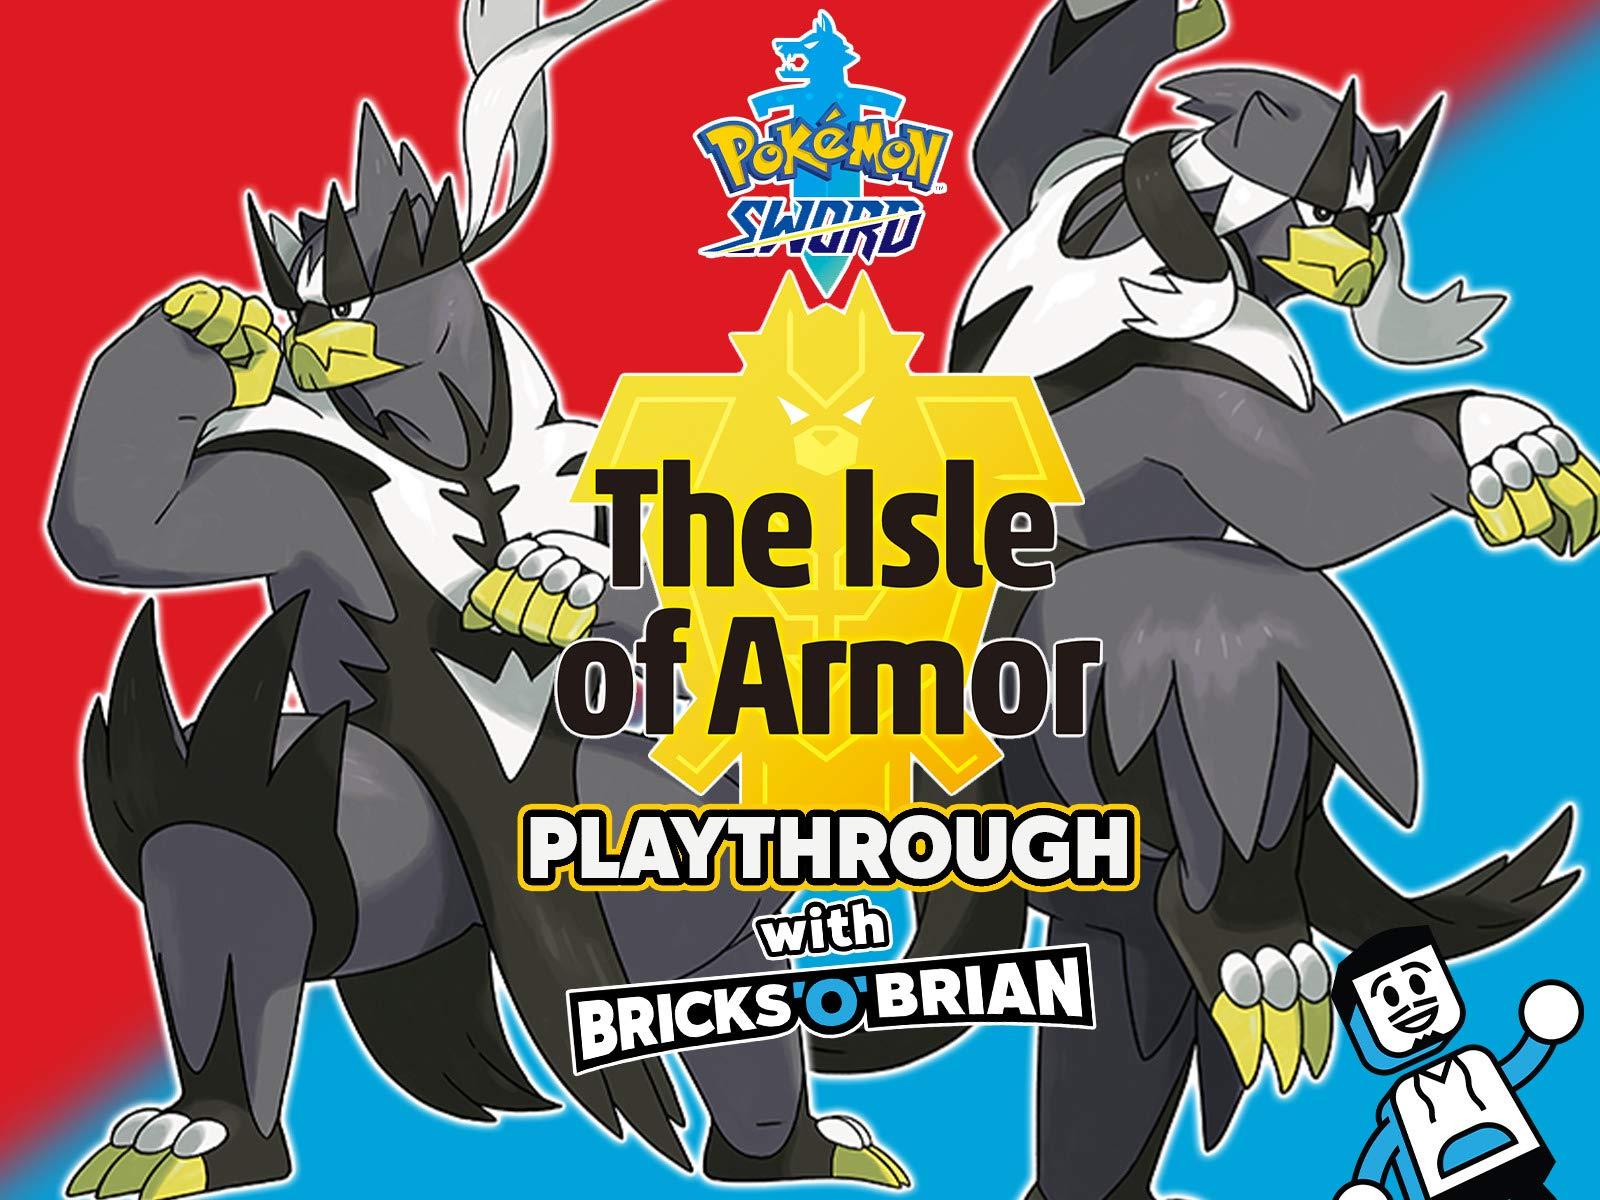 Clip: Pokemon Sword Isle of Armor with Bricks 'O' Brian! on Amazon Prime Video UK